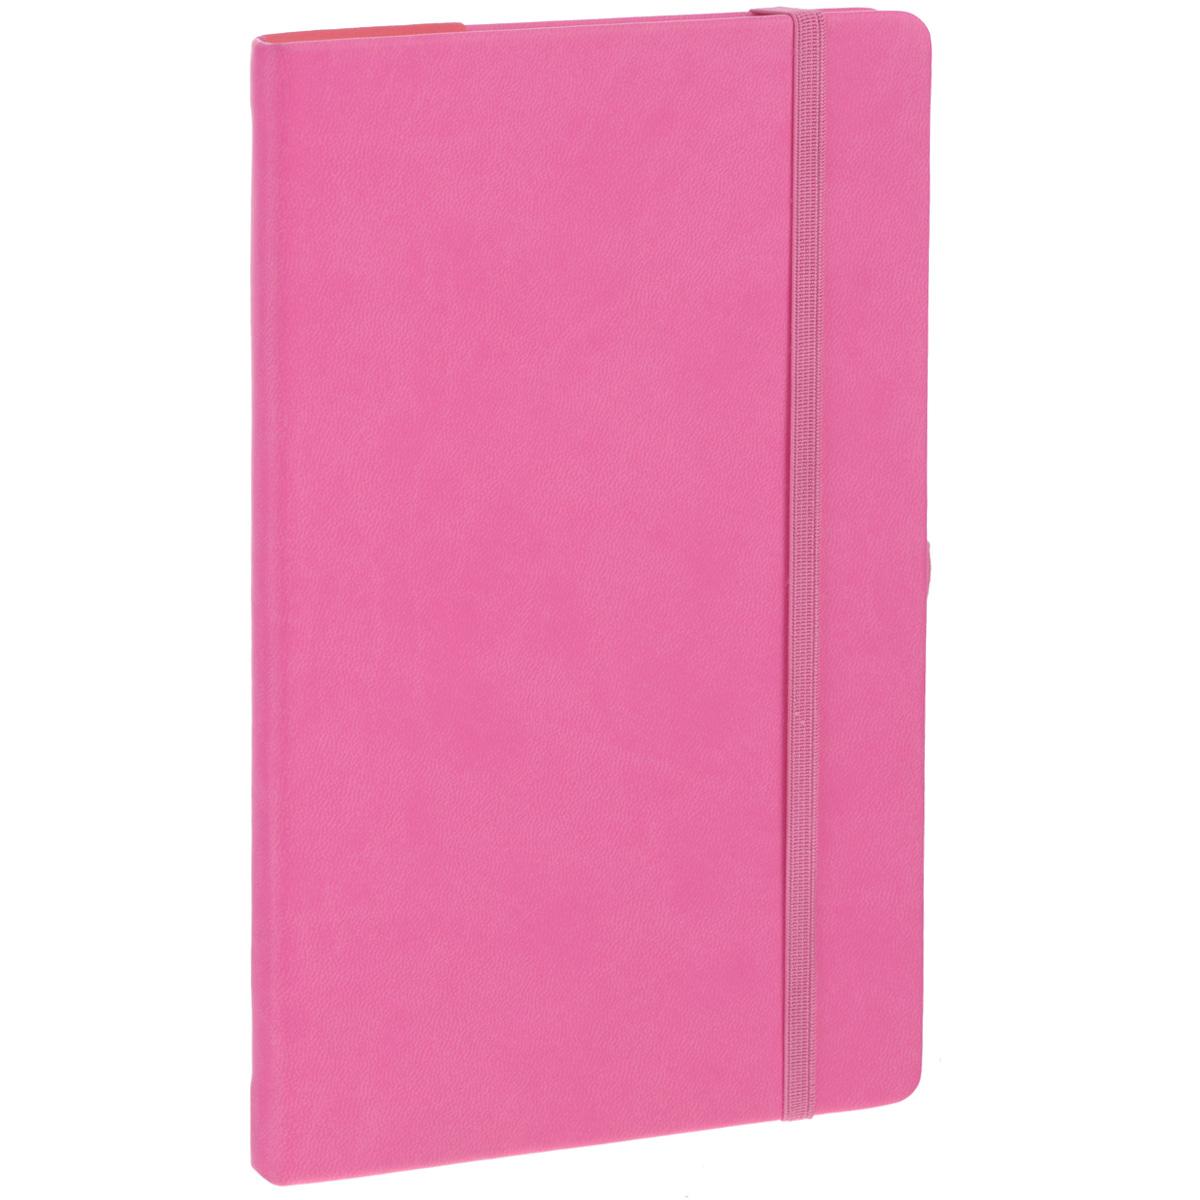 "Записная книжка Erich Krause ""Festival"", цвет: розовый, 96 листов 36757"